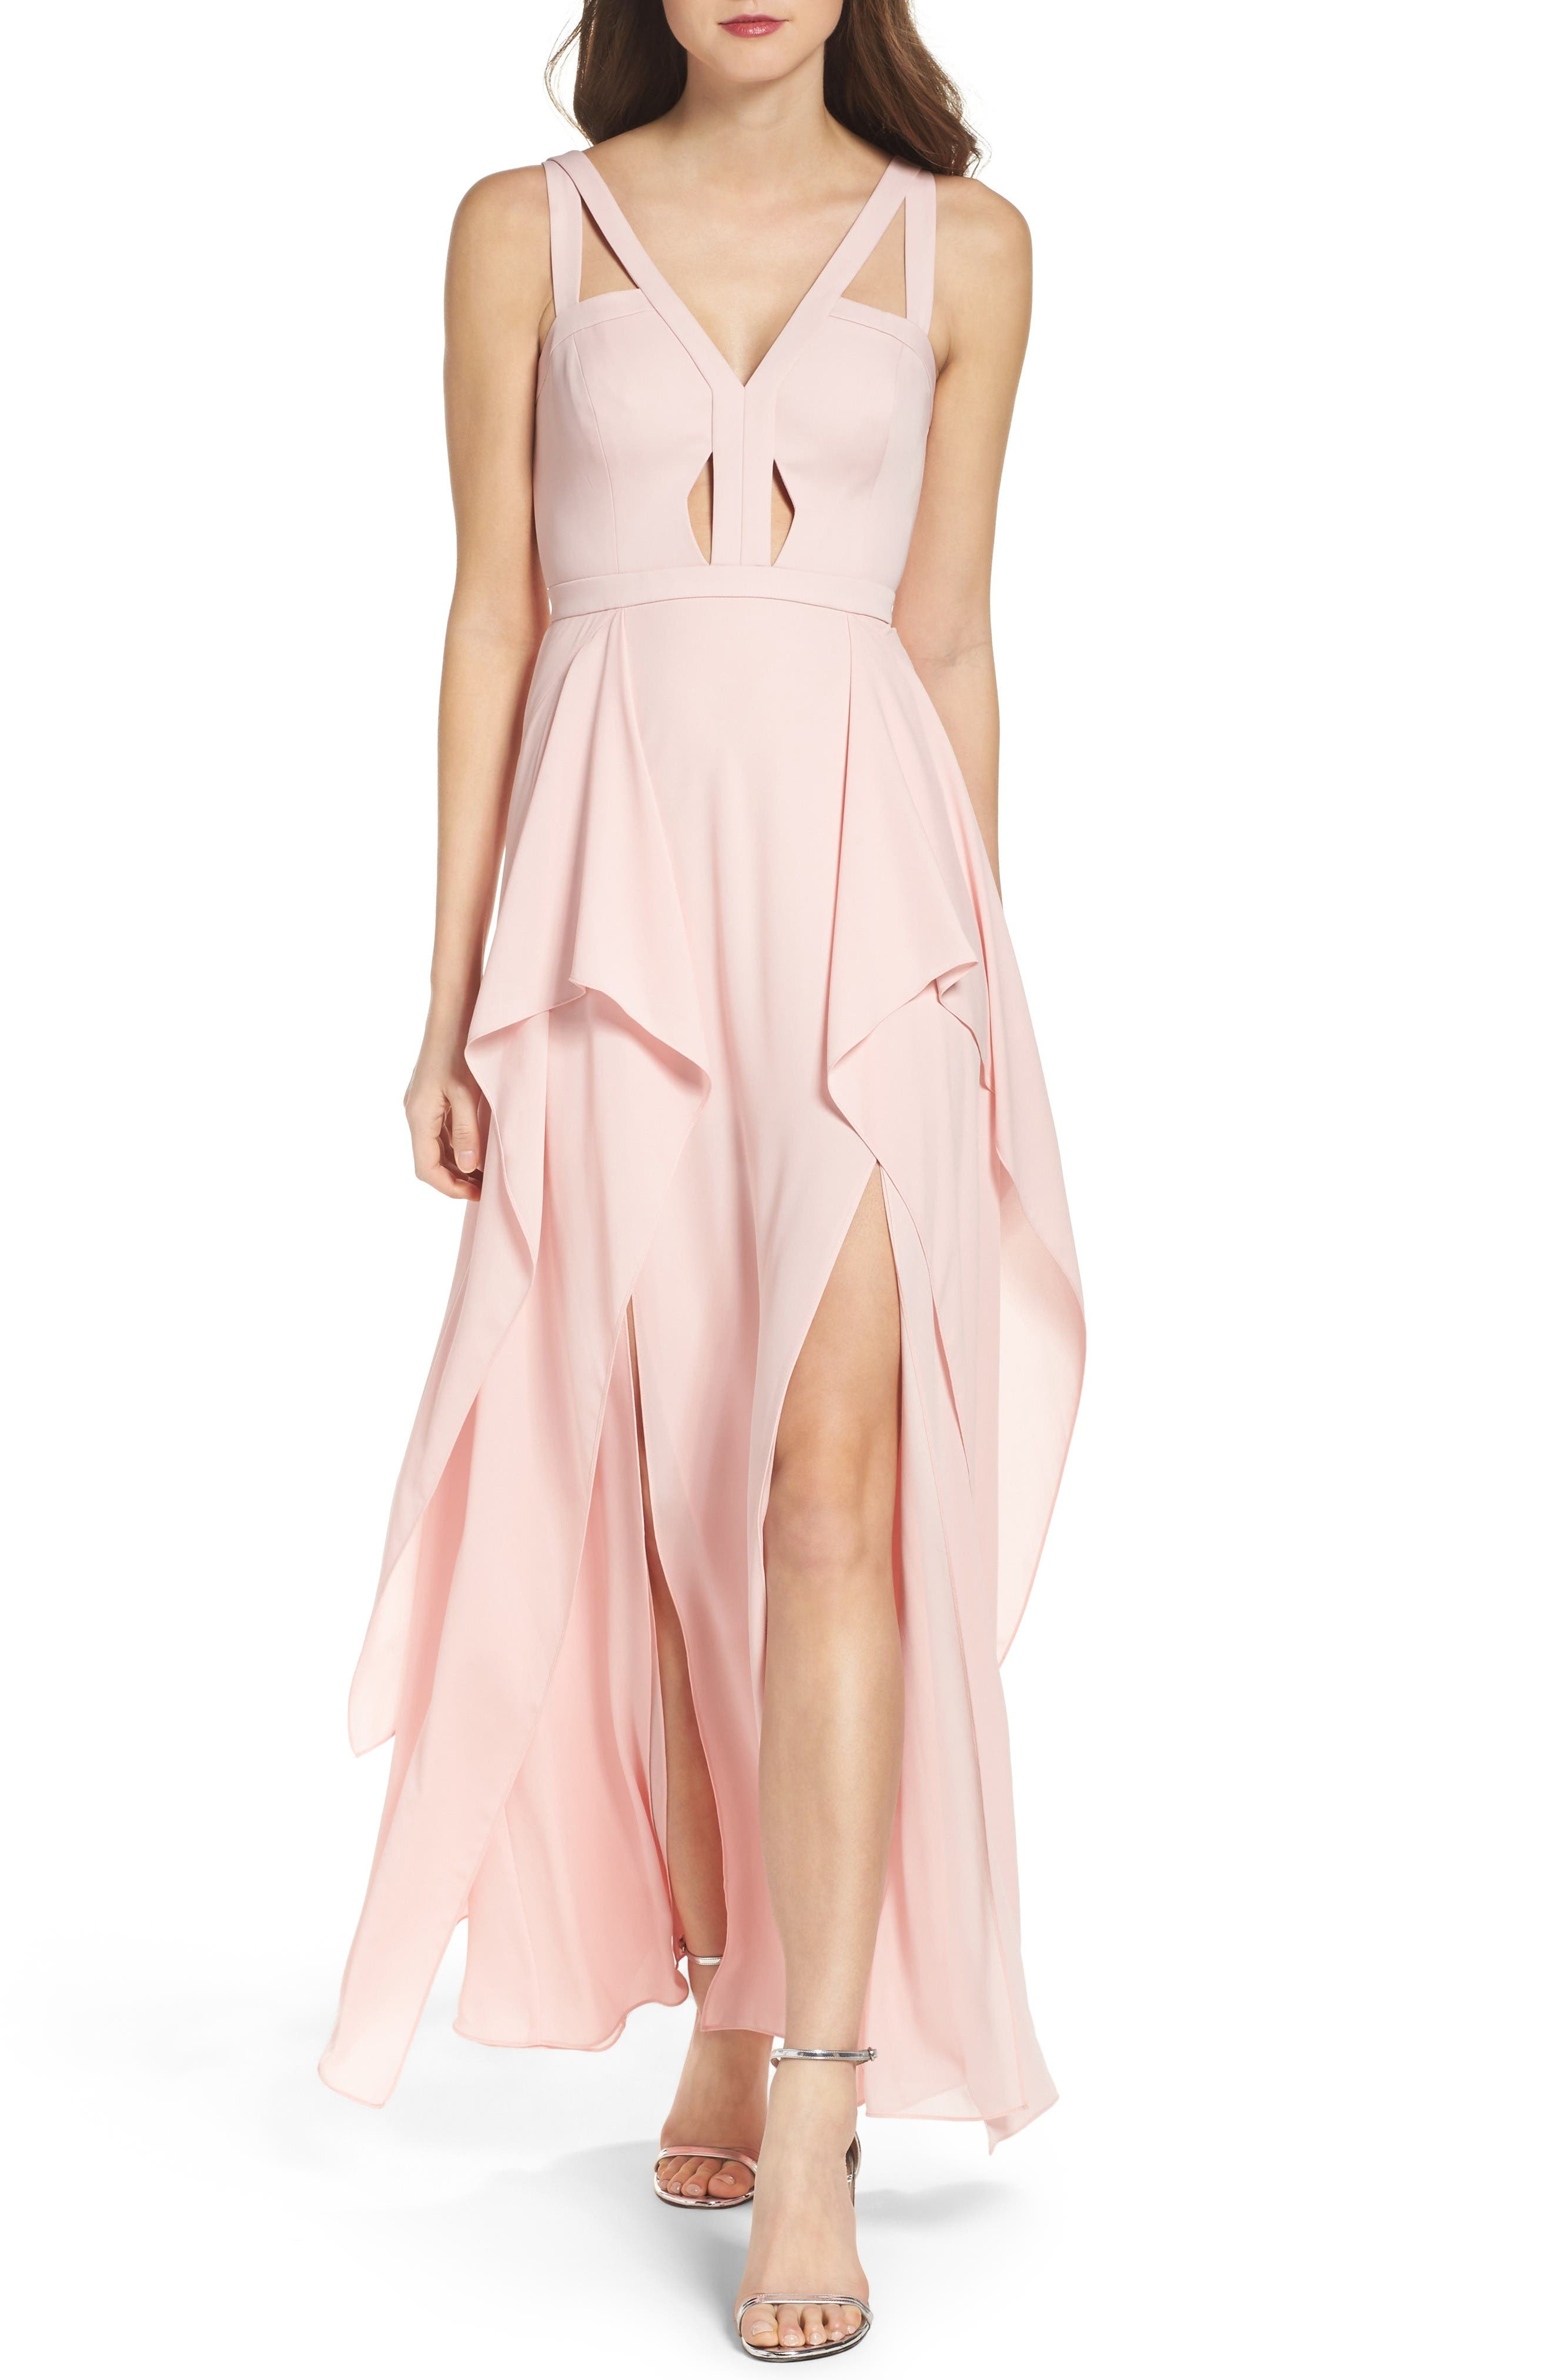 Main Image - BCBGMAXAZRIA 'Juliana' Georgette Fit & Flare Gown